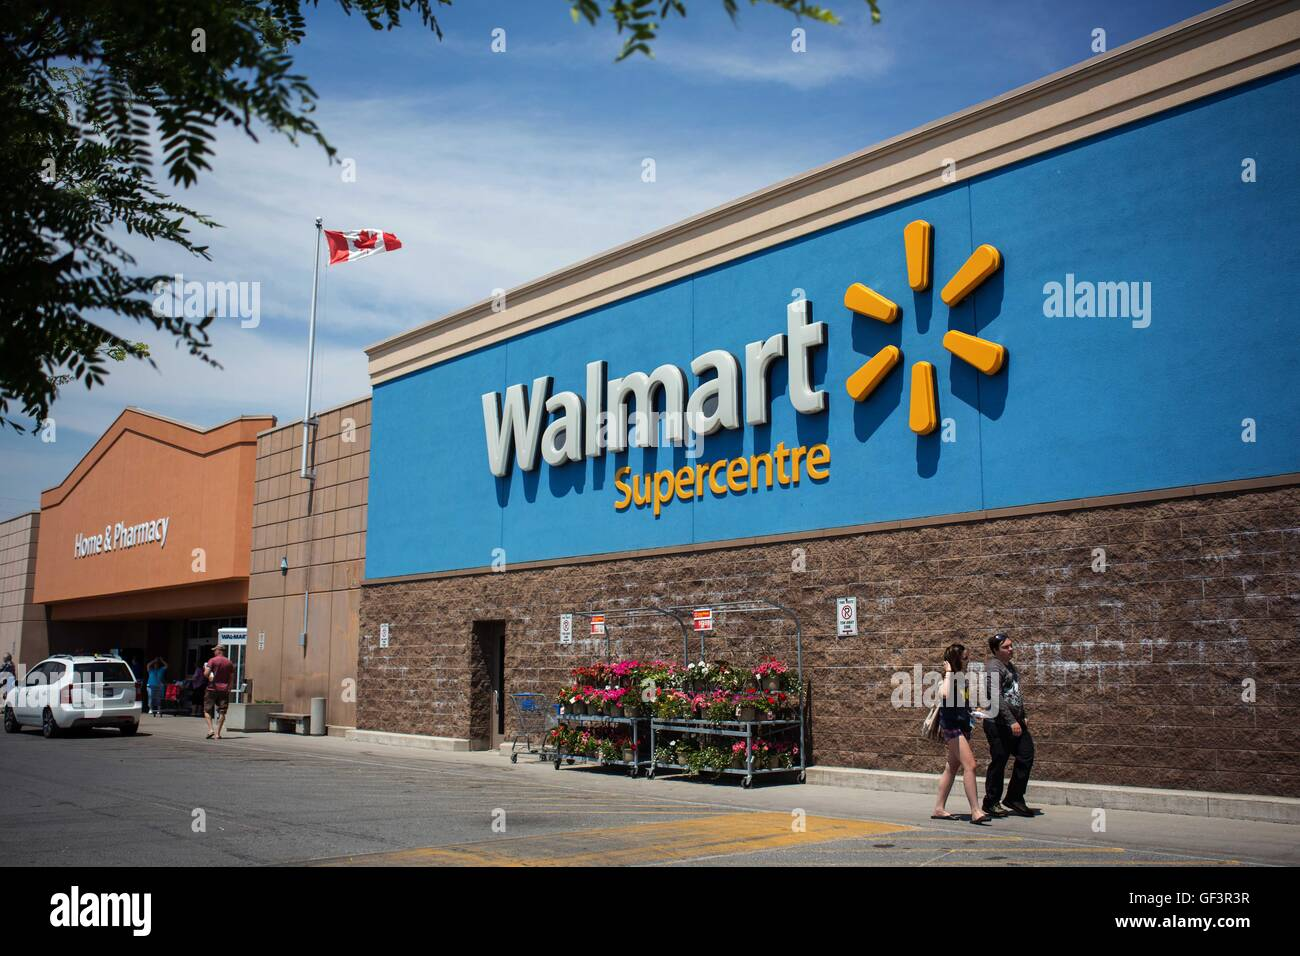 Walmart Canada Stock Photos & Walmart Canada Stock Images - Alamy